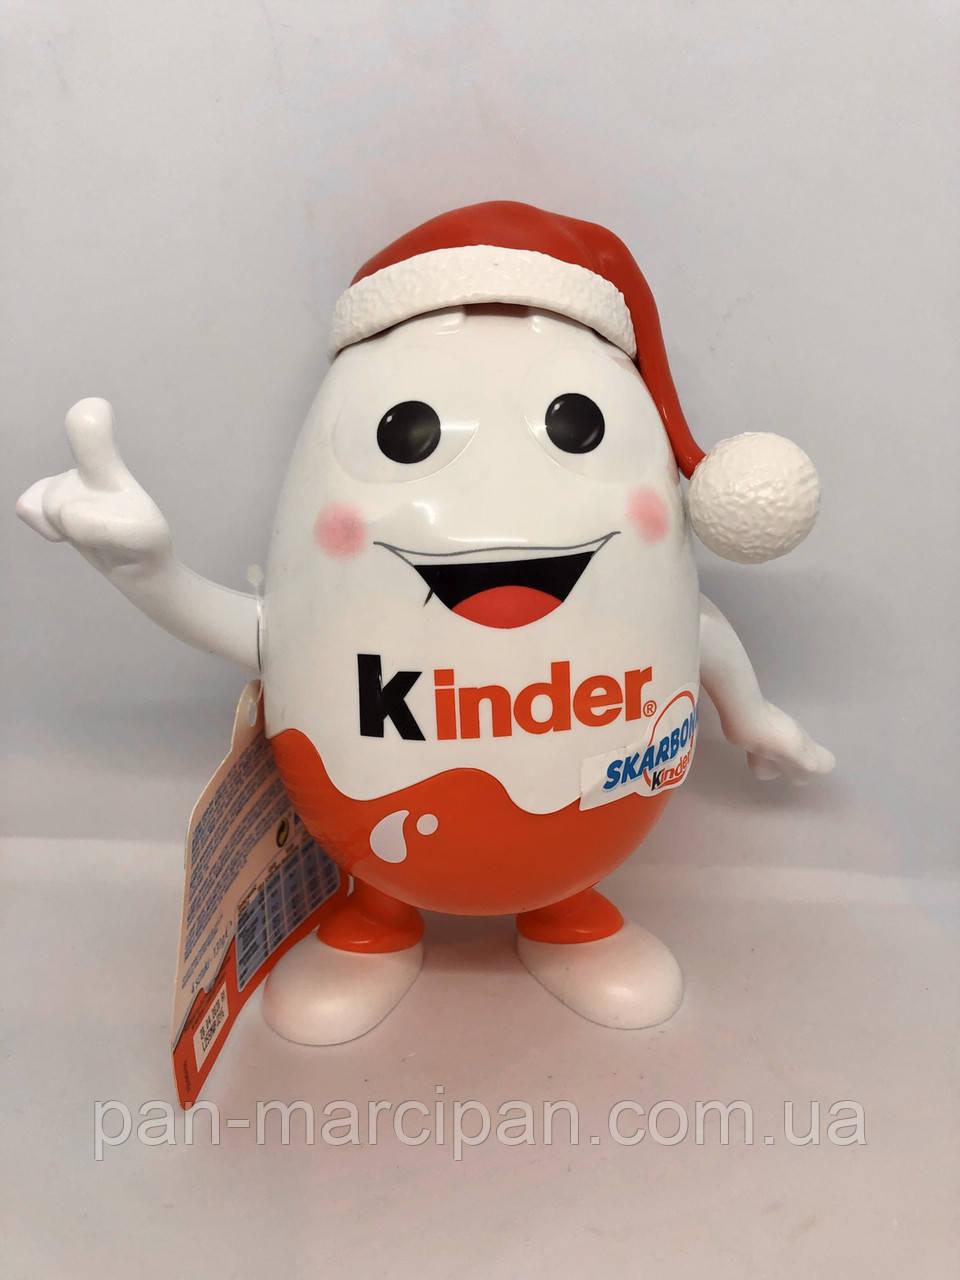 Іграшка-скарбничка Kinder з солодощами 131 г